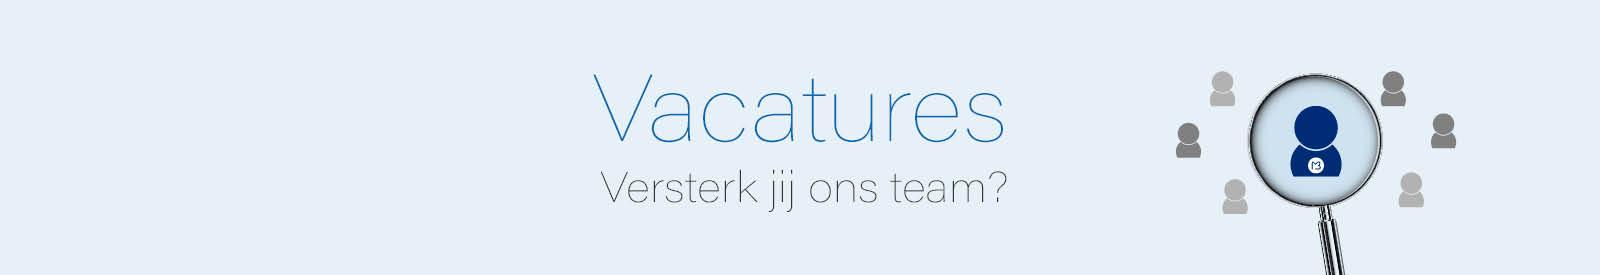 Vacatures header